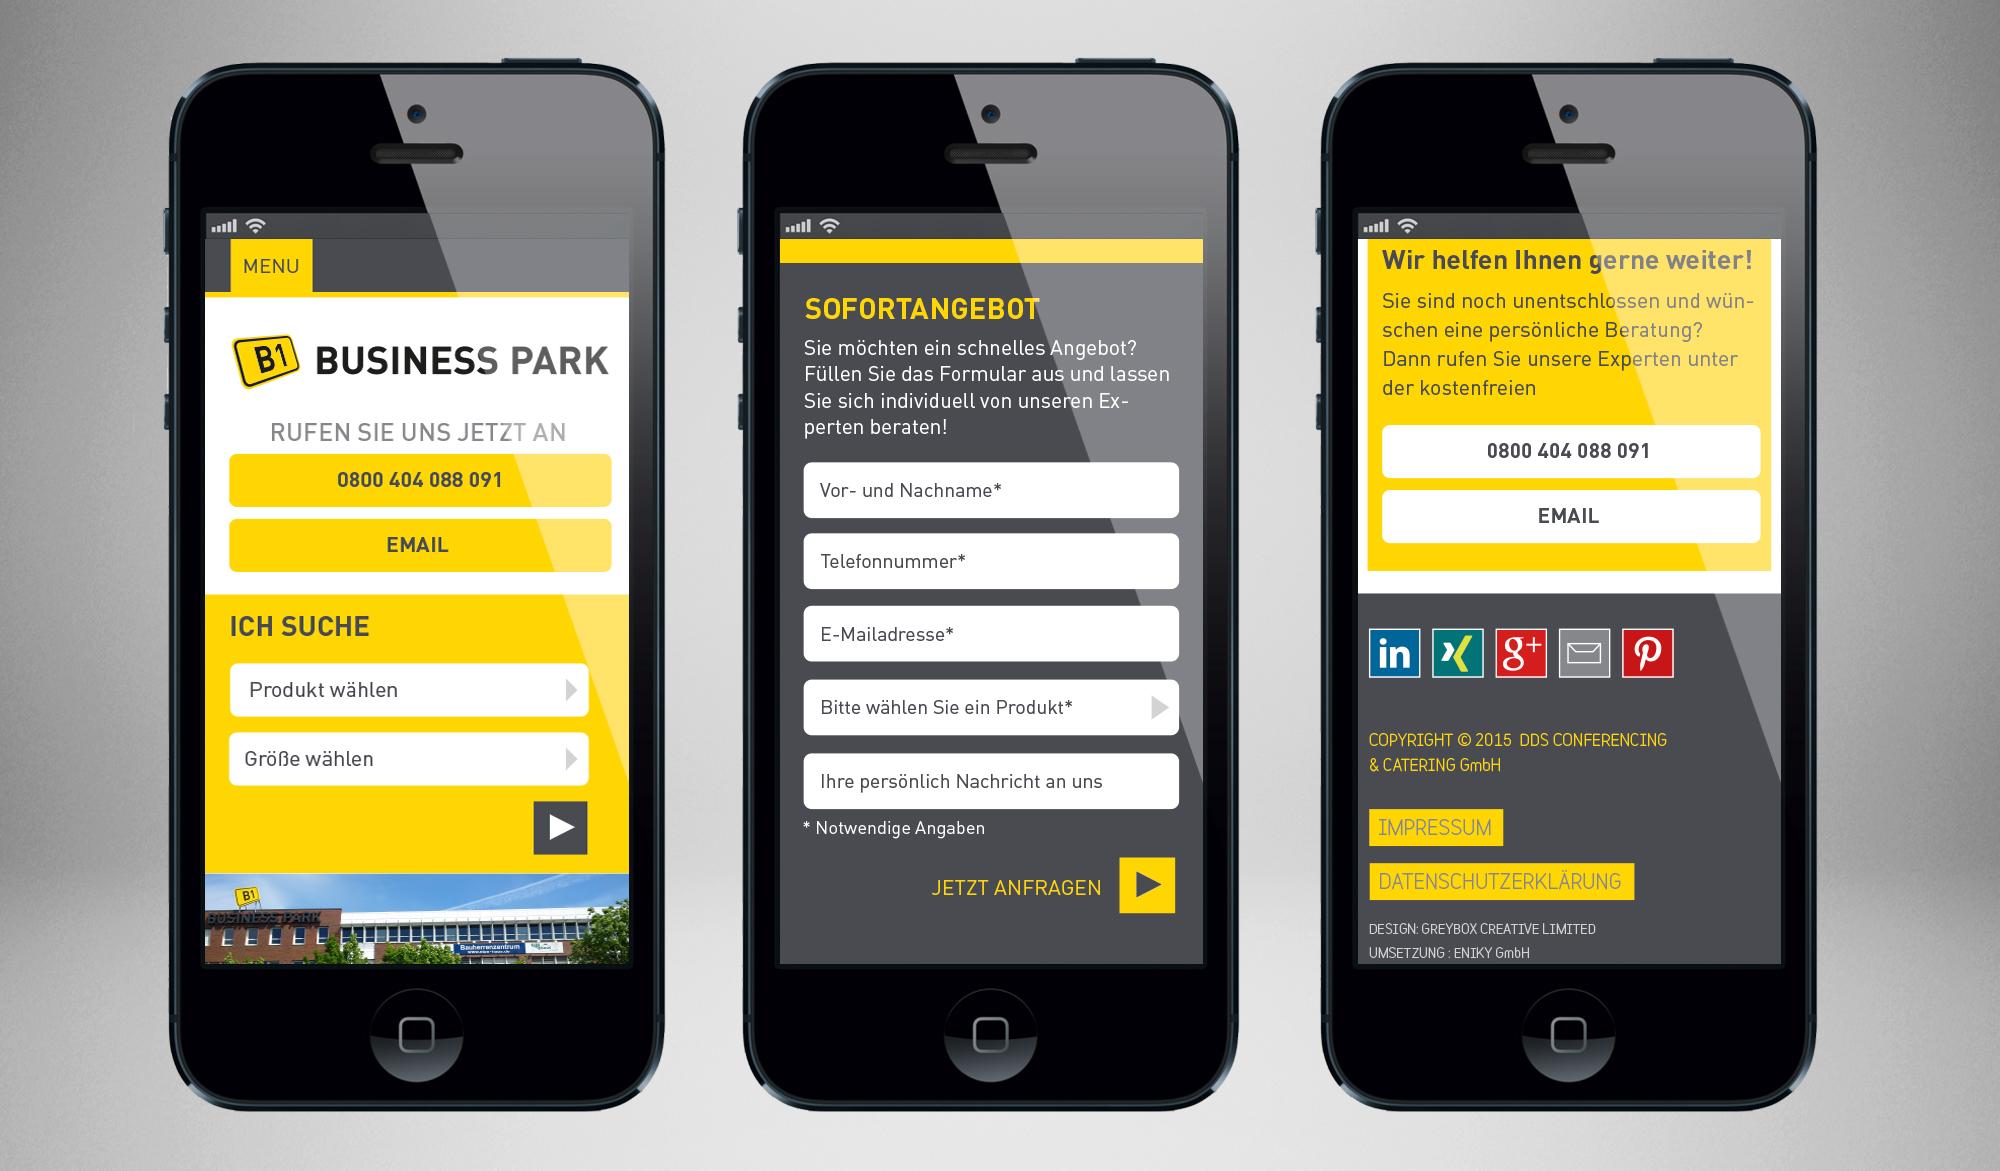 B1 Business Park mobile website